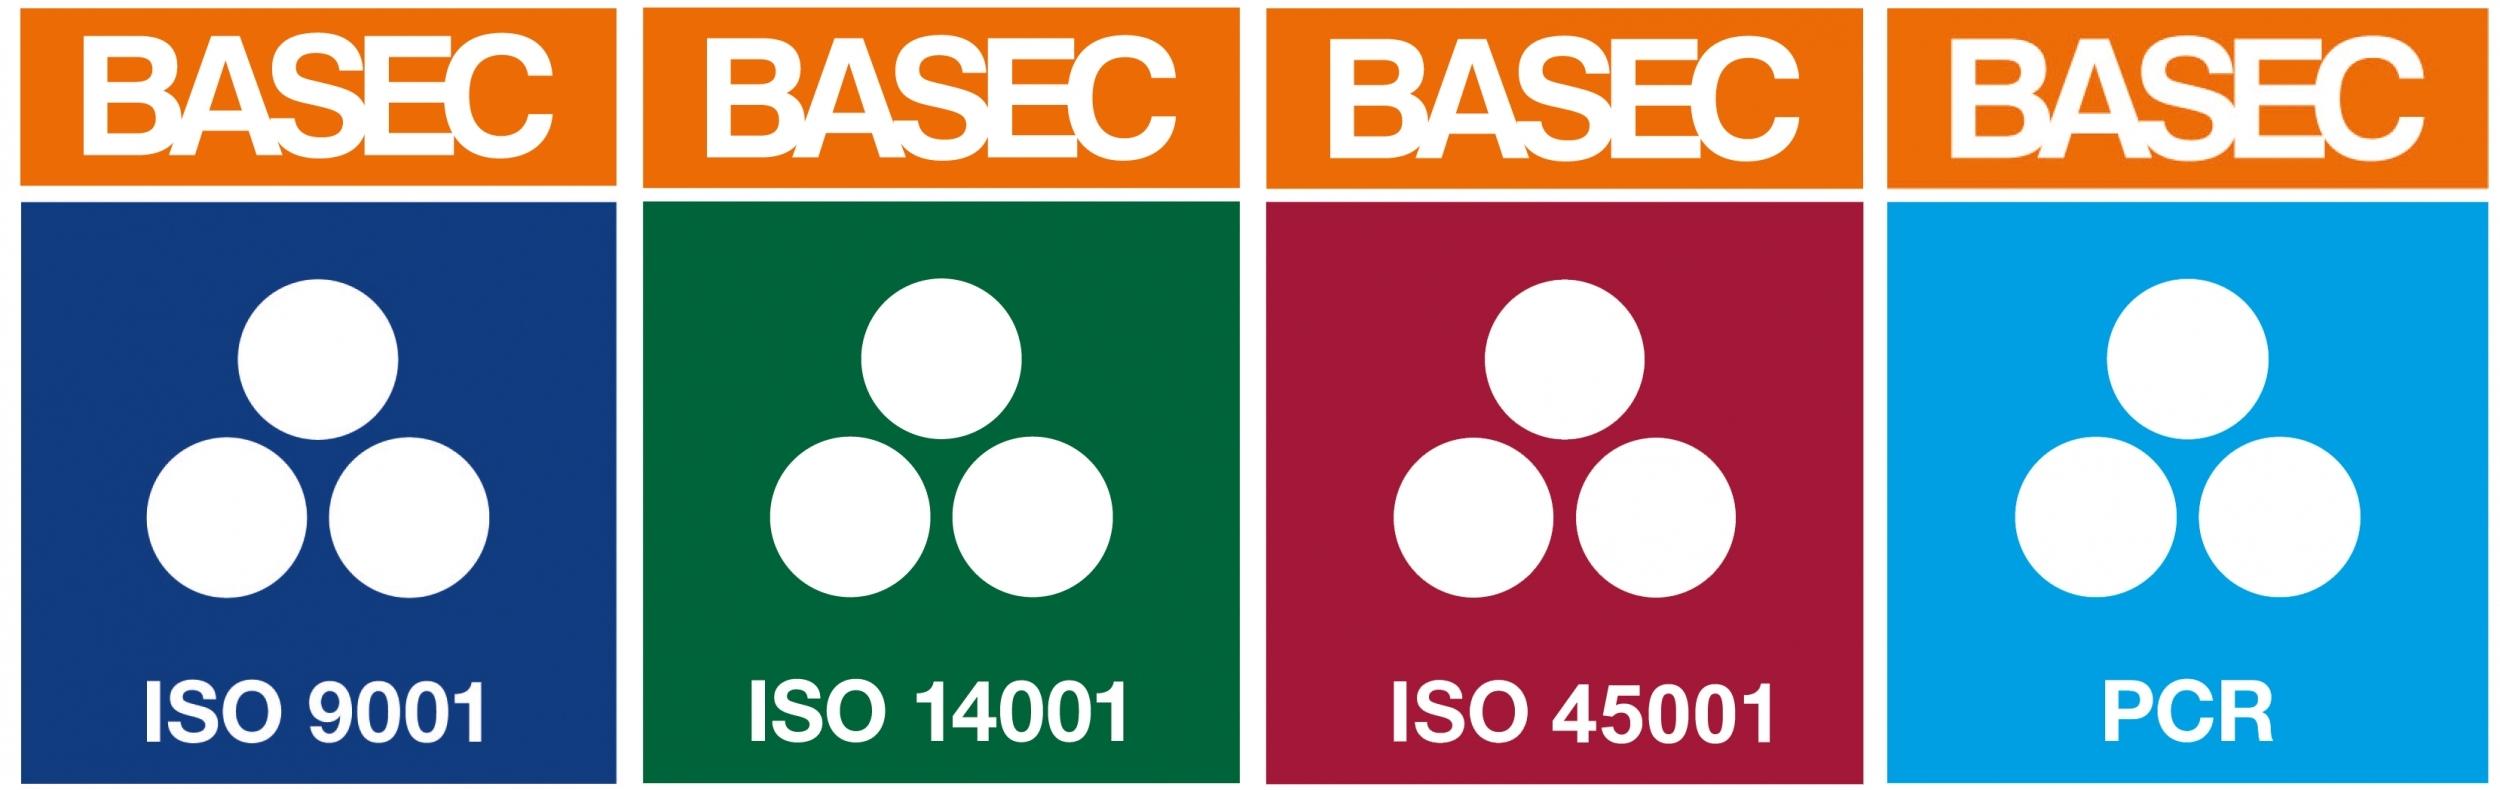 4-ISOs-banner-inc-45001-hi-res.jpg